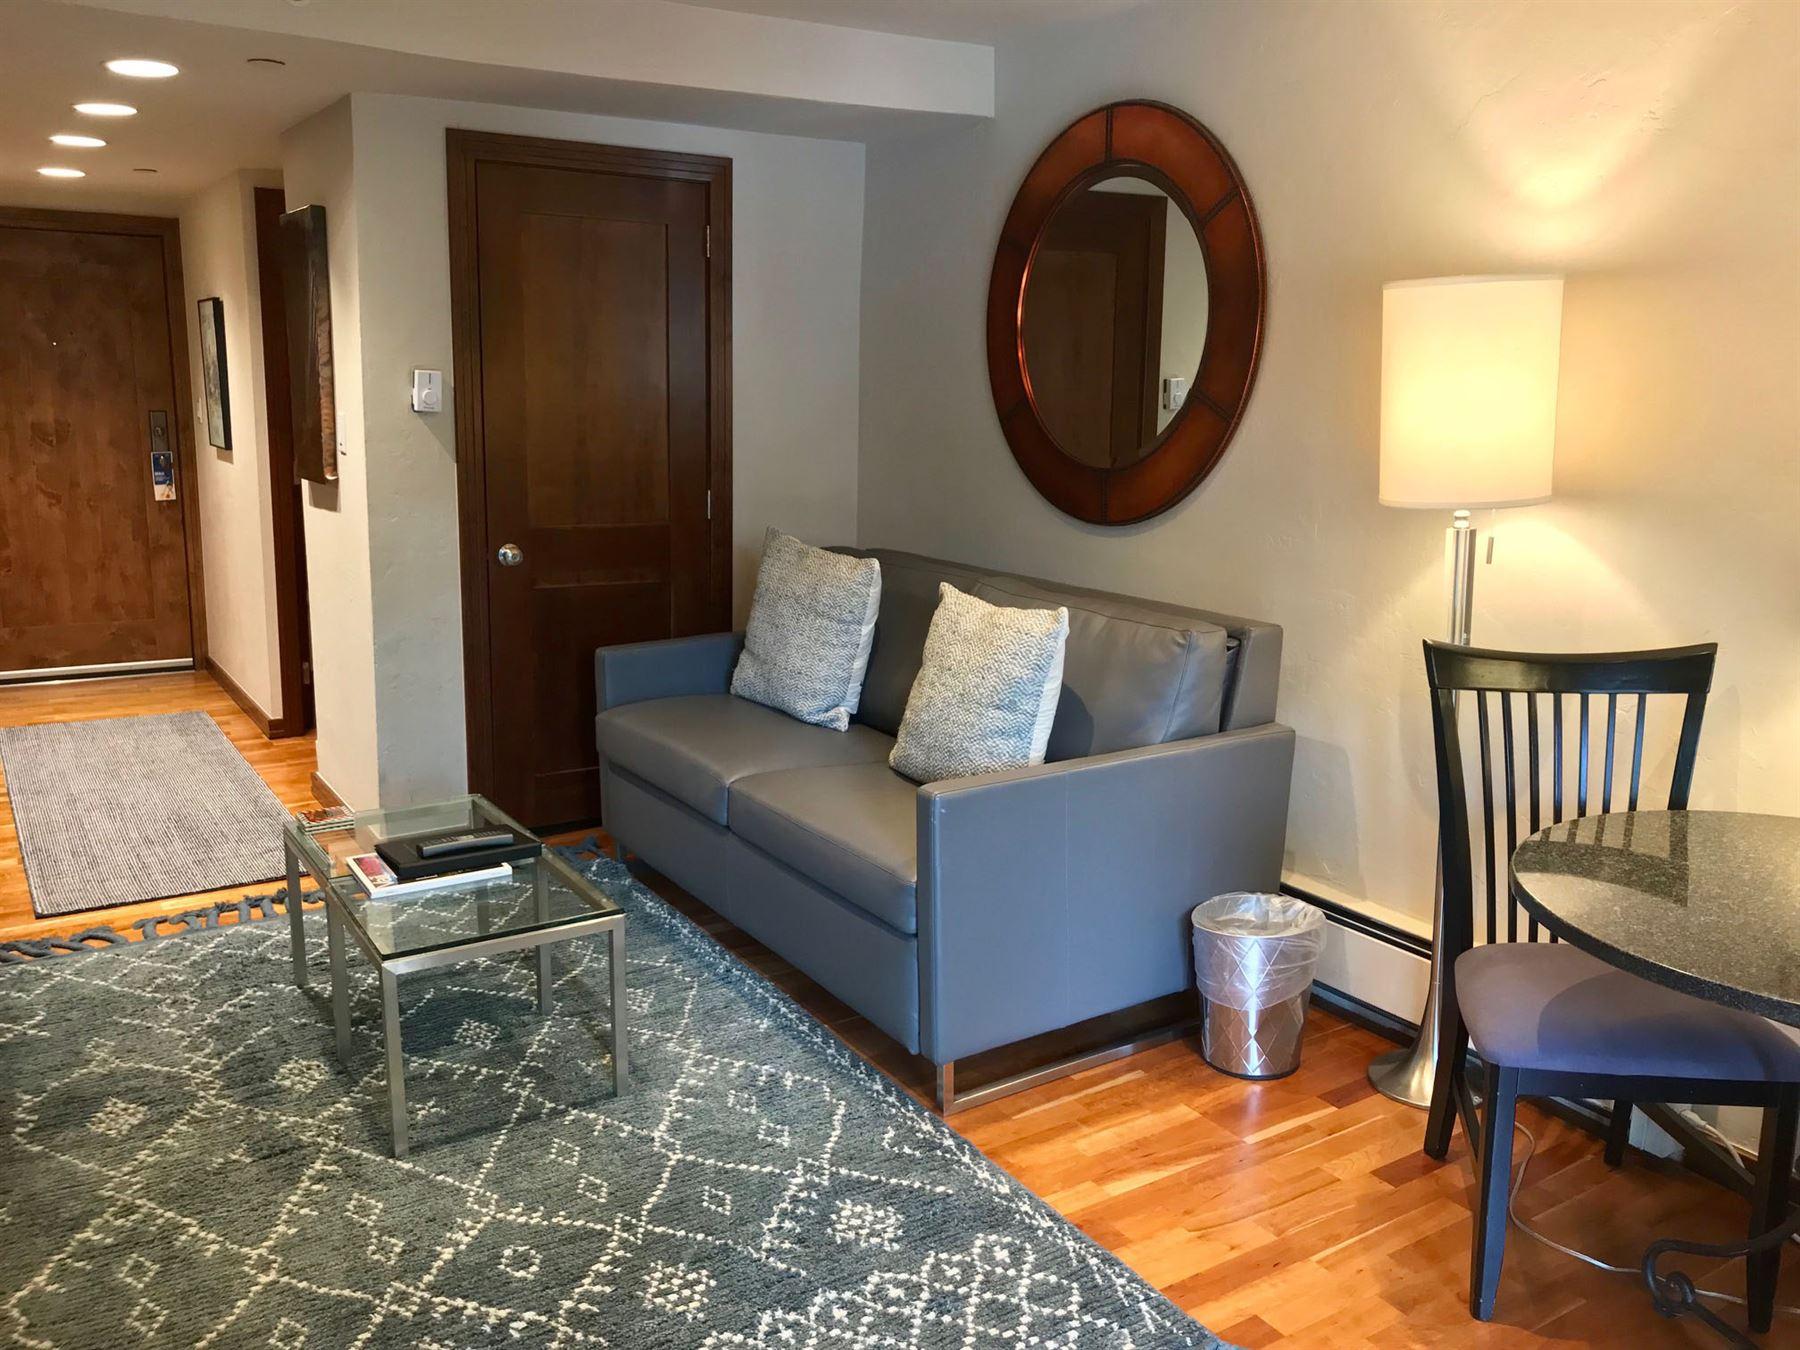 Studio_Plat_Living room_sofa